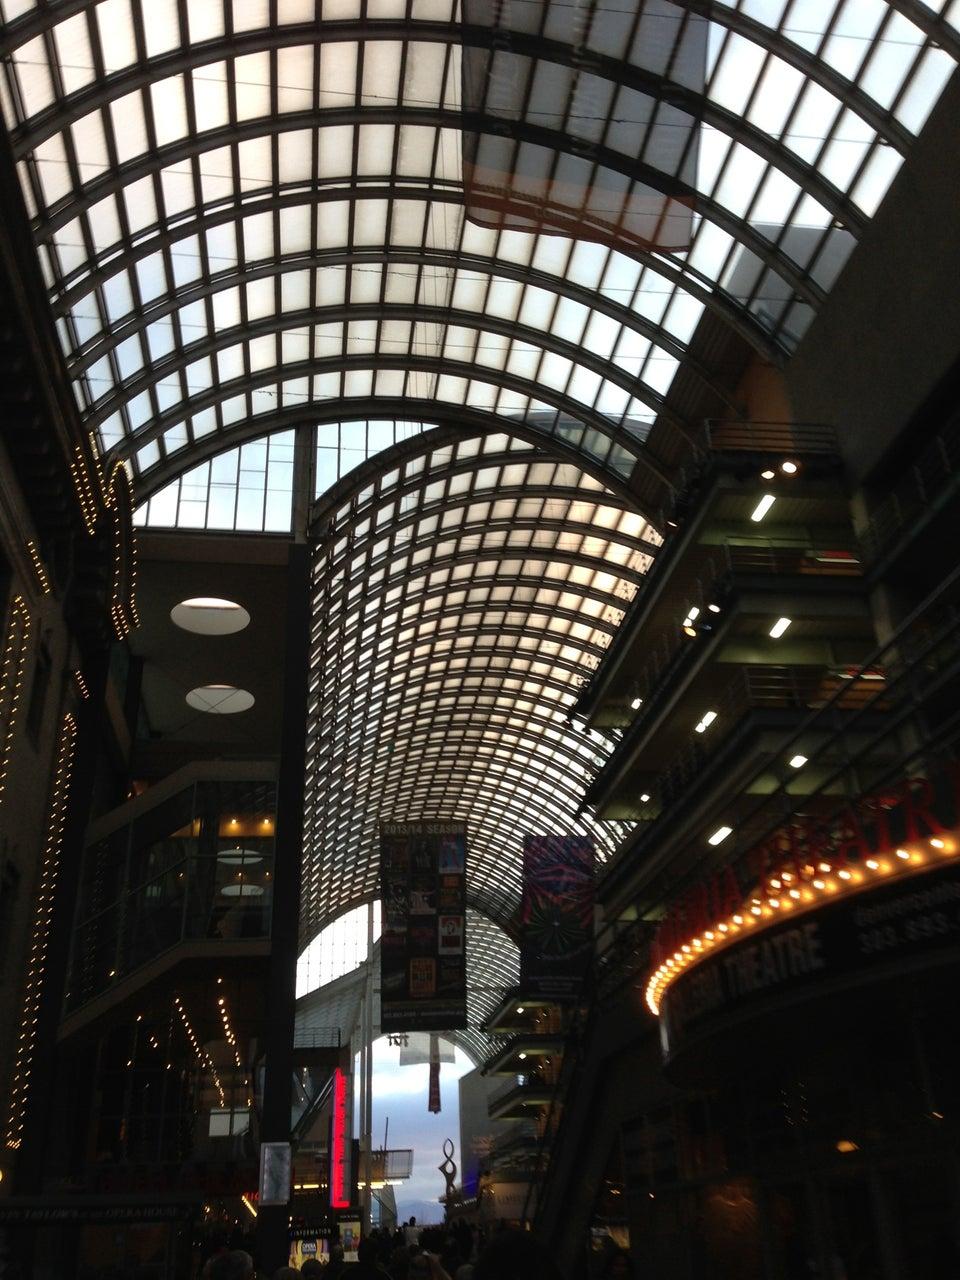 Denver Center for the Performing Arts 1101 13th St, Denver